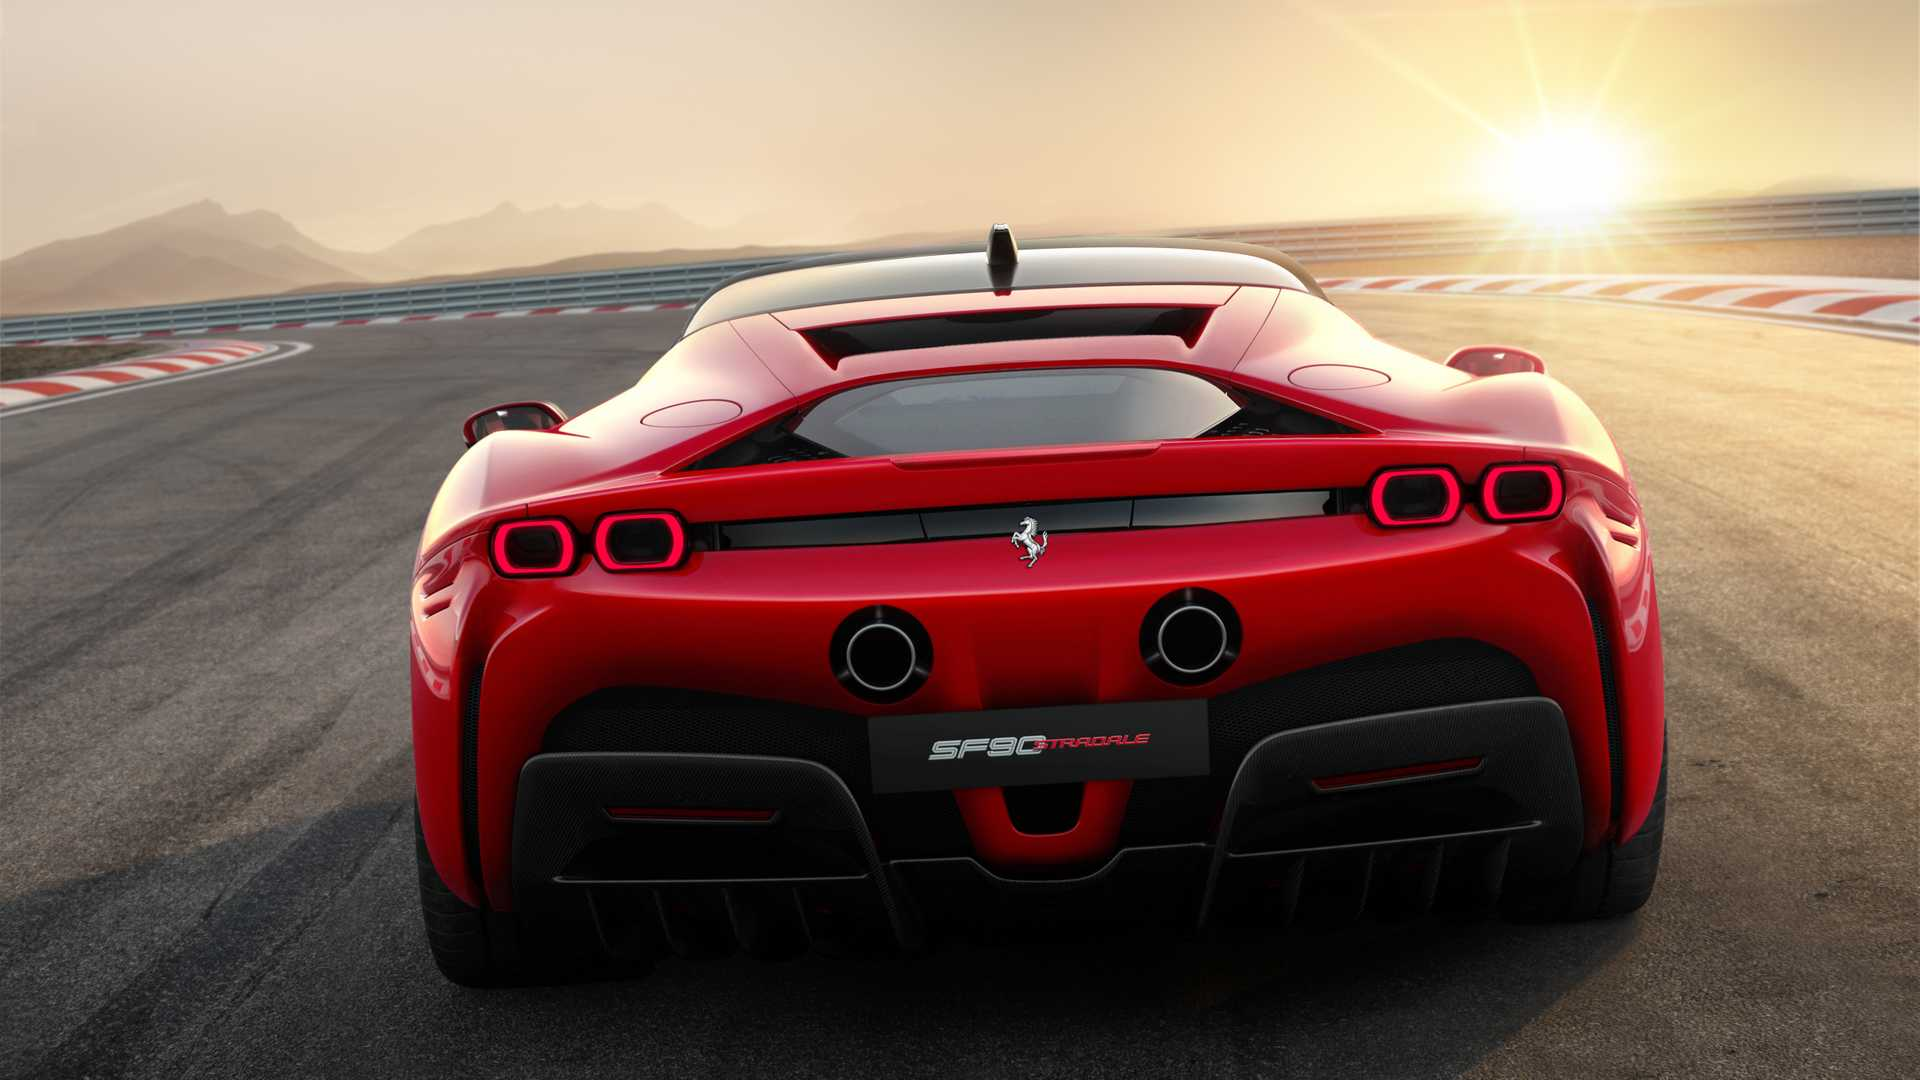 Ferrari Sf90 Stradale Supercarro Hibrido Plug In Surge Com 1 000 Cv